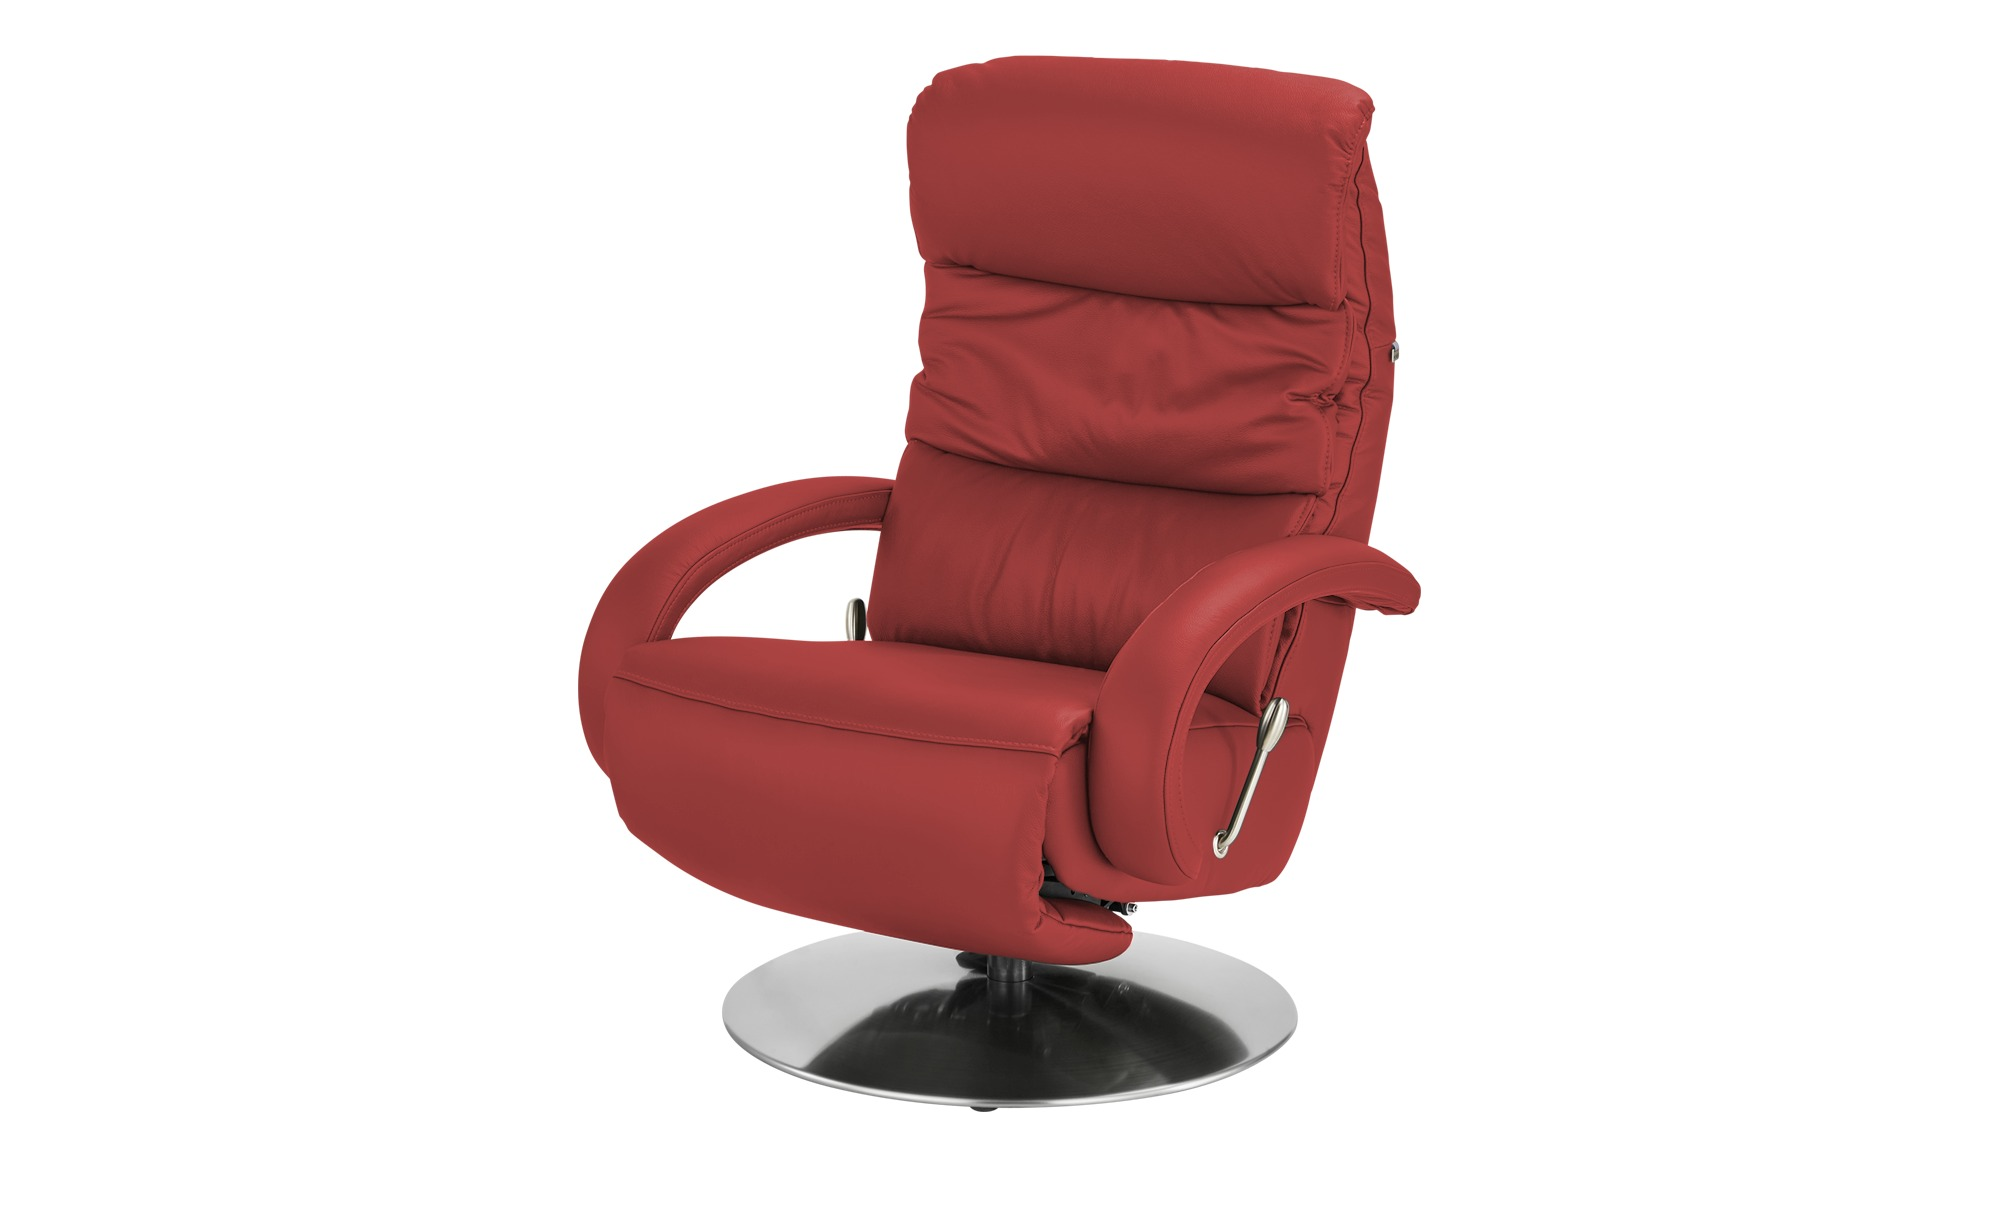 Hukla Leder-Relaxsessel  Florian ¦ rot ¦ Maße (cm): B: 73 H: 102 T: 91 Polstermöbel > Sessel > Fernsehsessel - Höffner